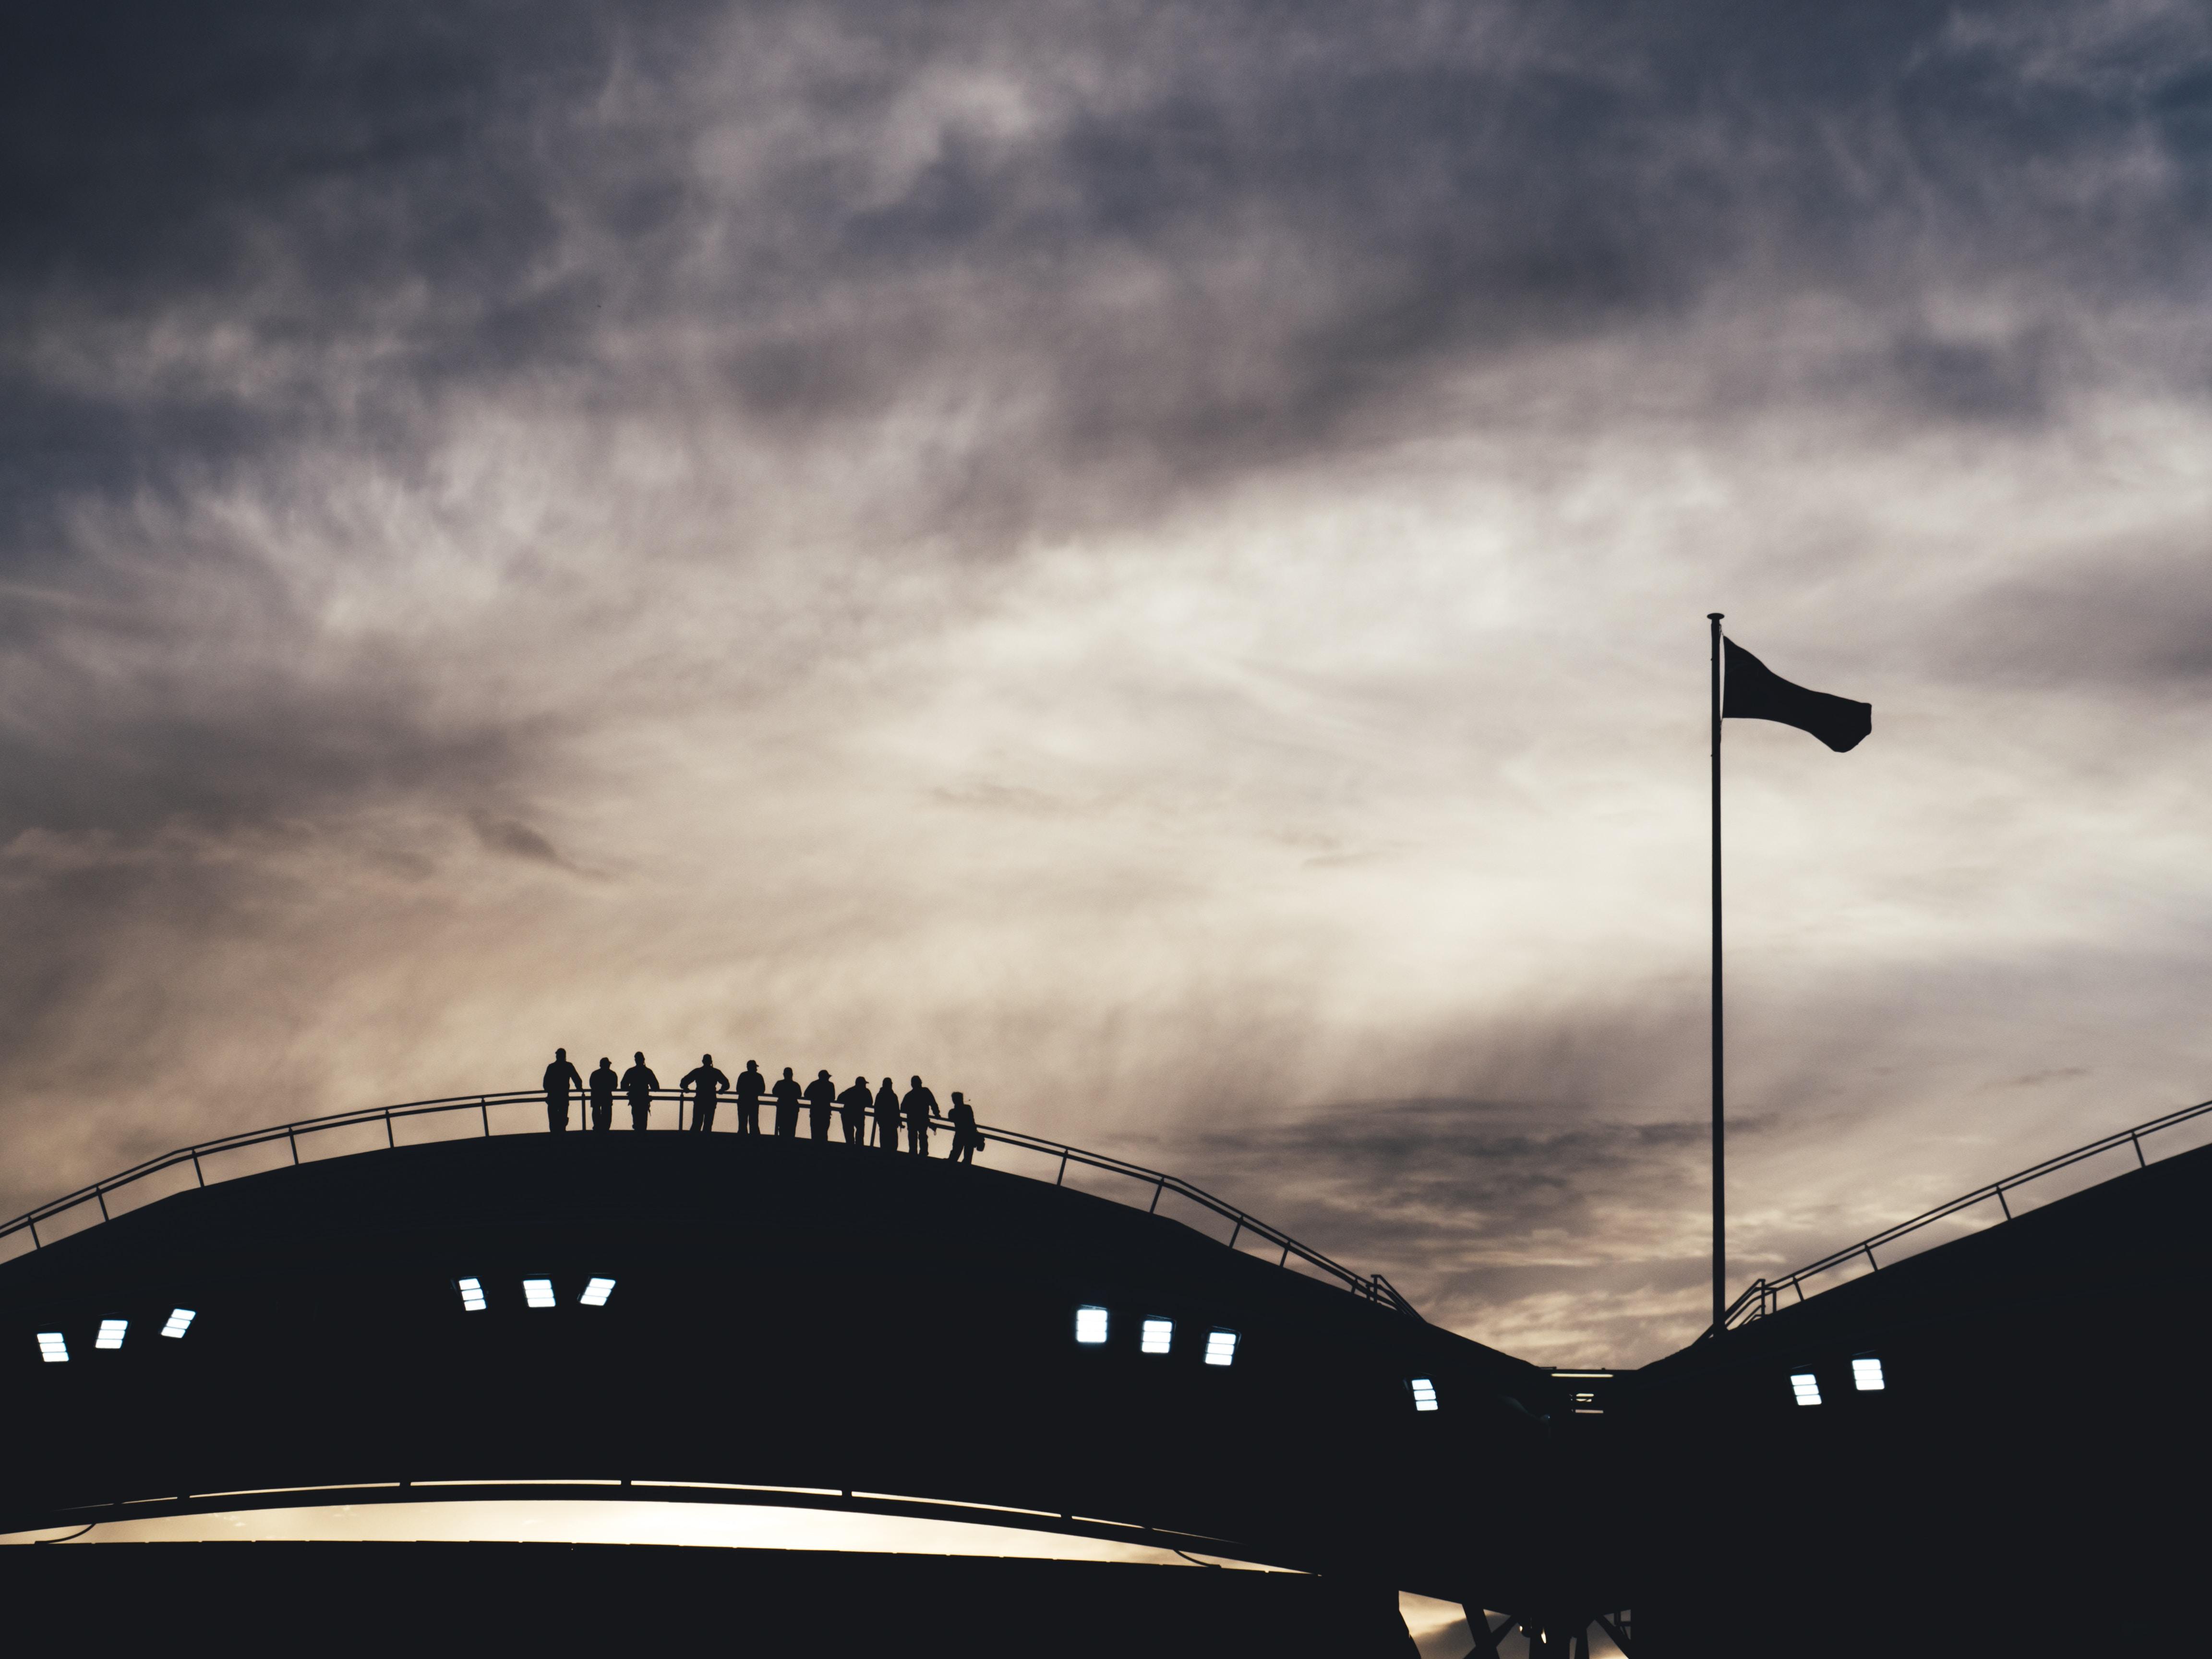 silhouette photo of people standing on bridge